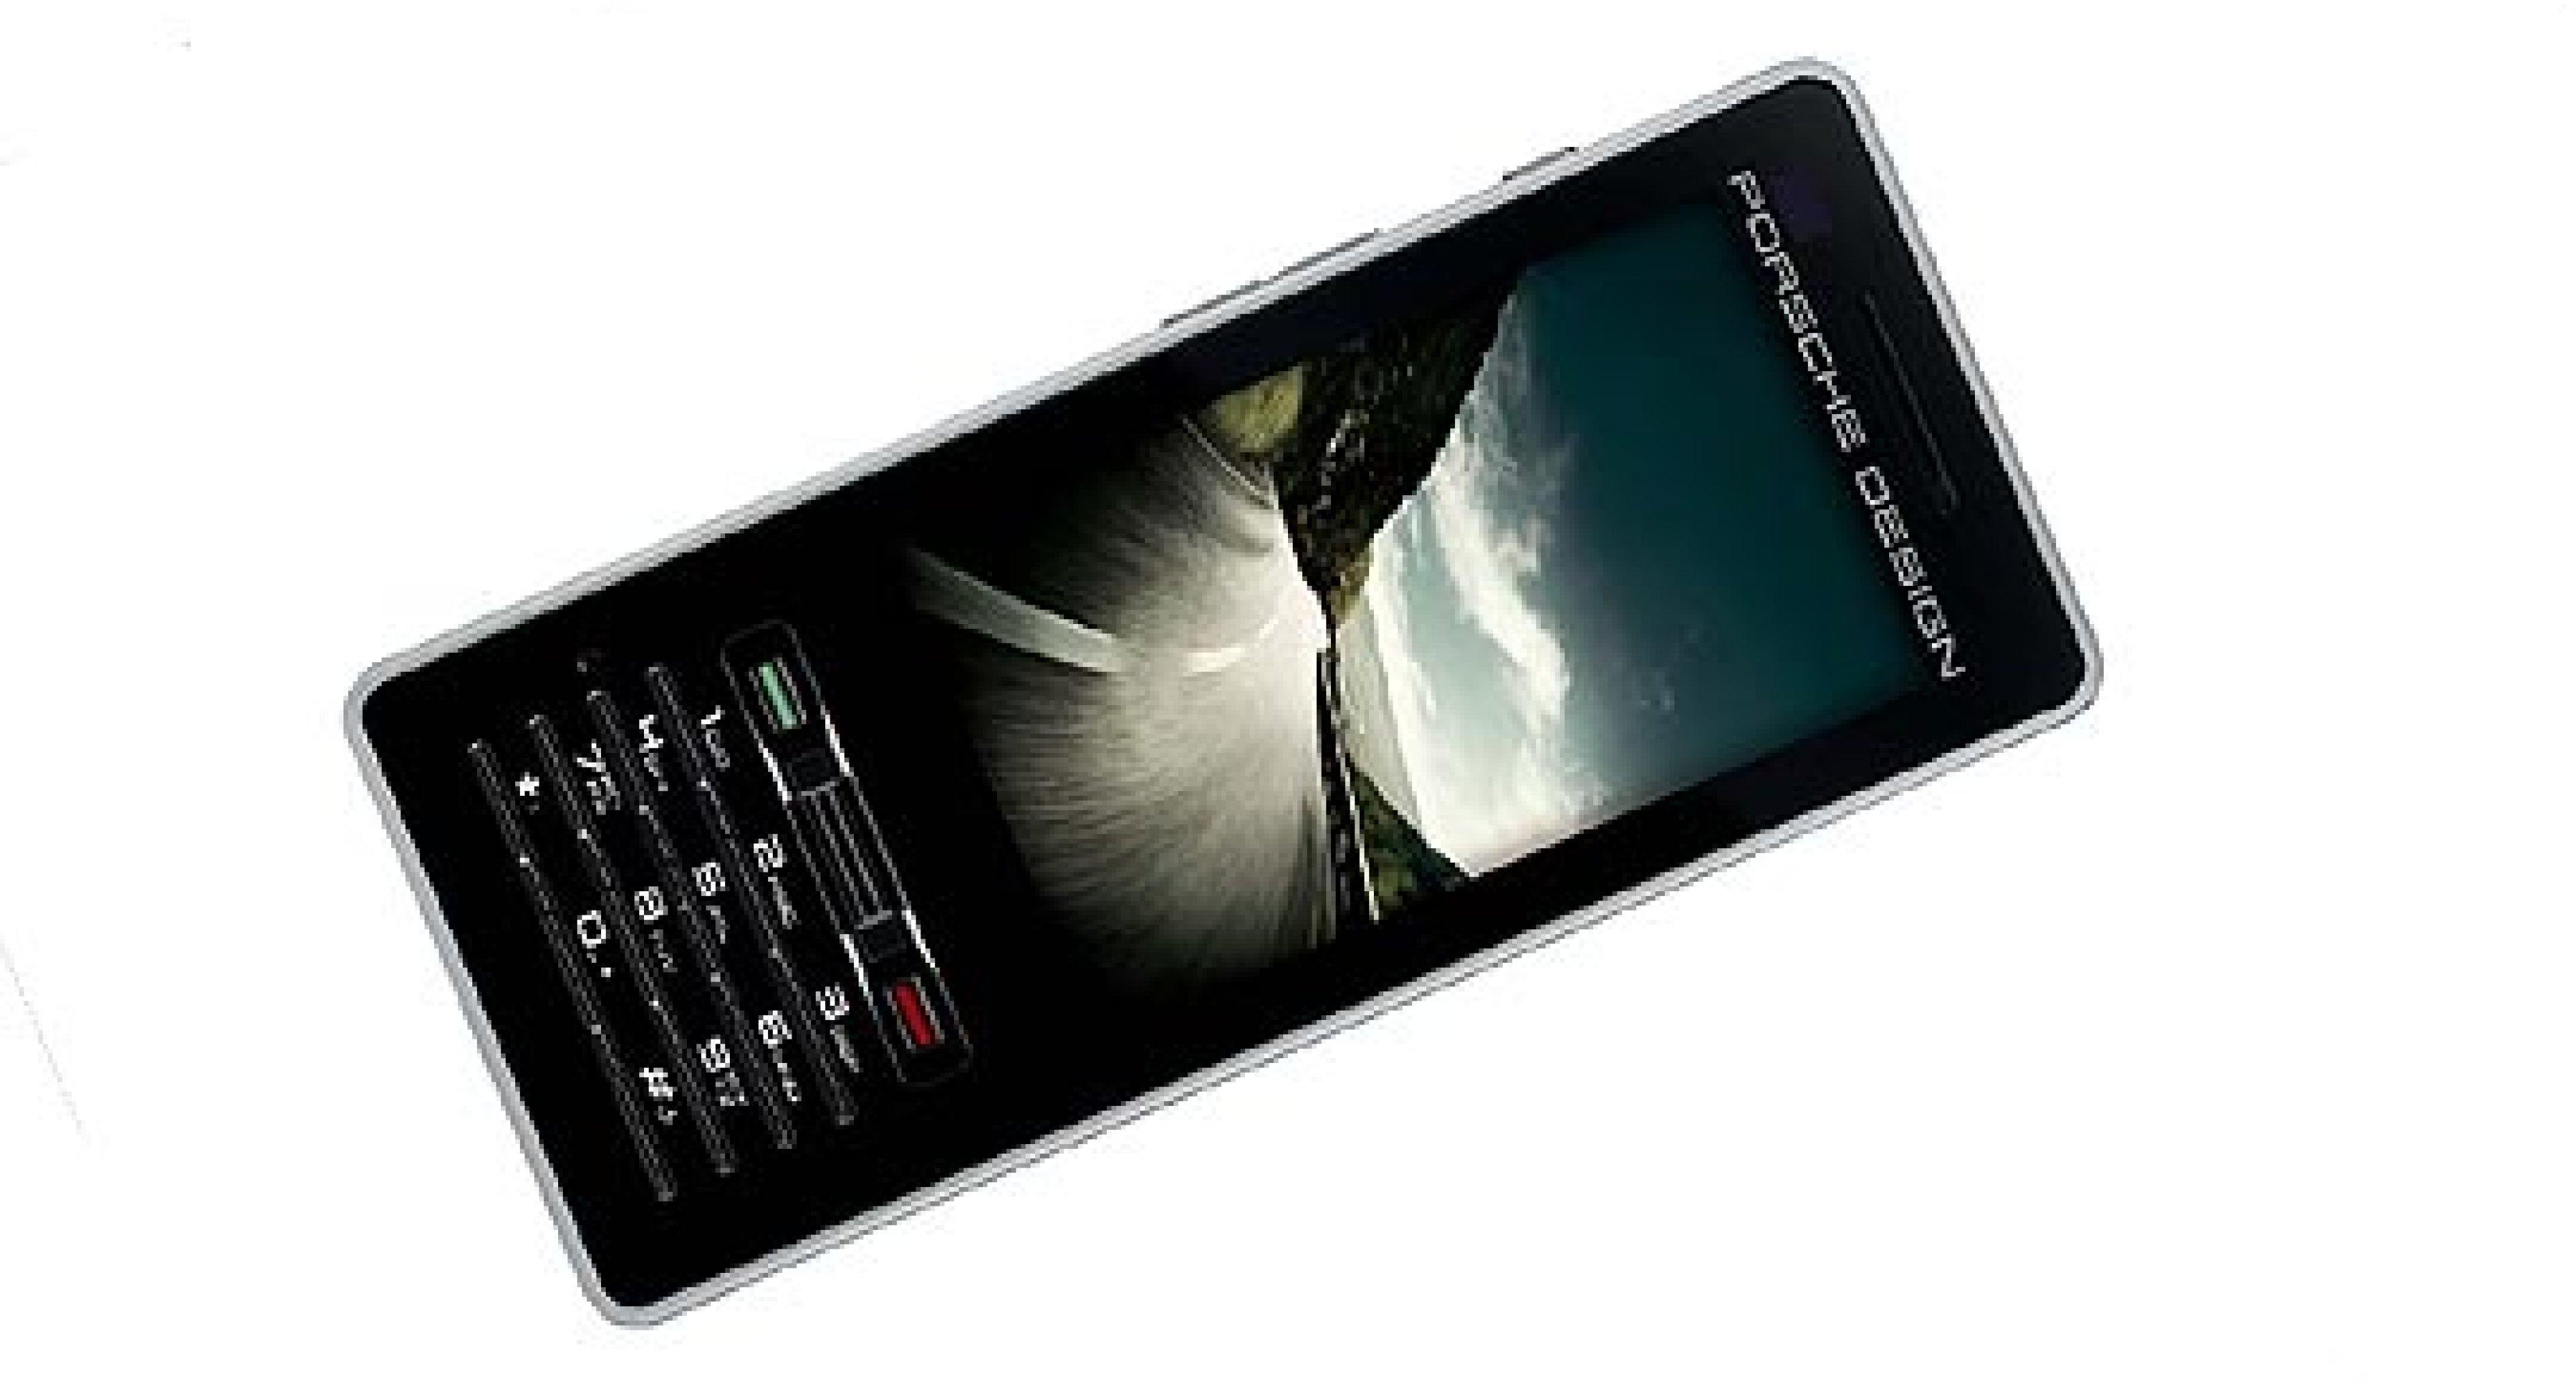 P9522: Latest Mobile Phone from Porsche Design